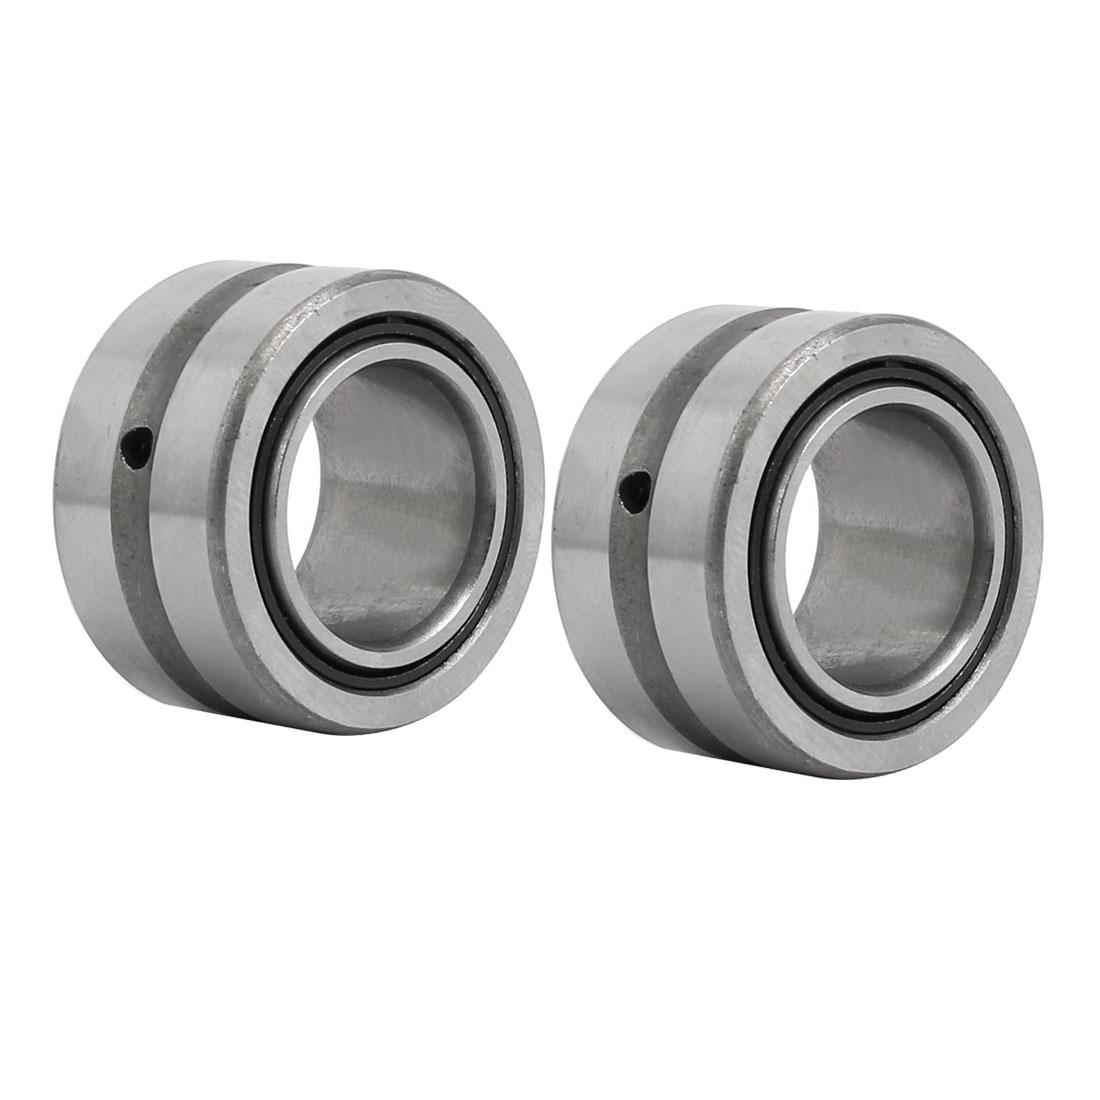 NKI17/16 17mmx29mmx16mm Inner Ring Needle Roller Bearing Silver Tone 2pcs